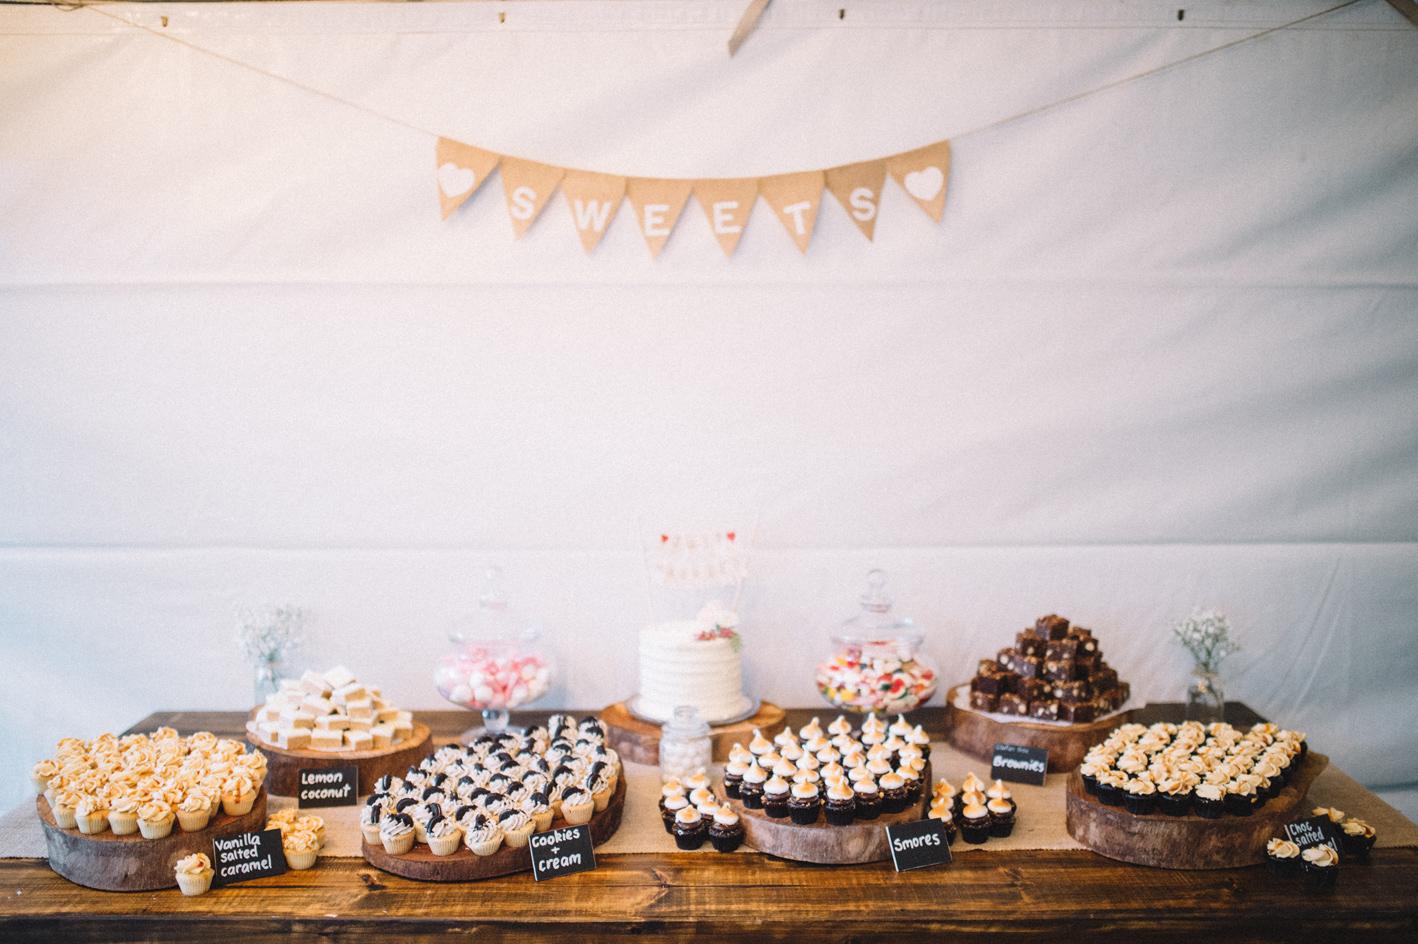 067-michelle-reagan-mount-tamborine-wedding-sophie-baker-photography